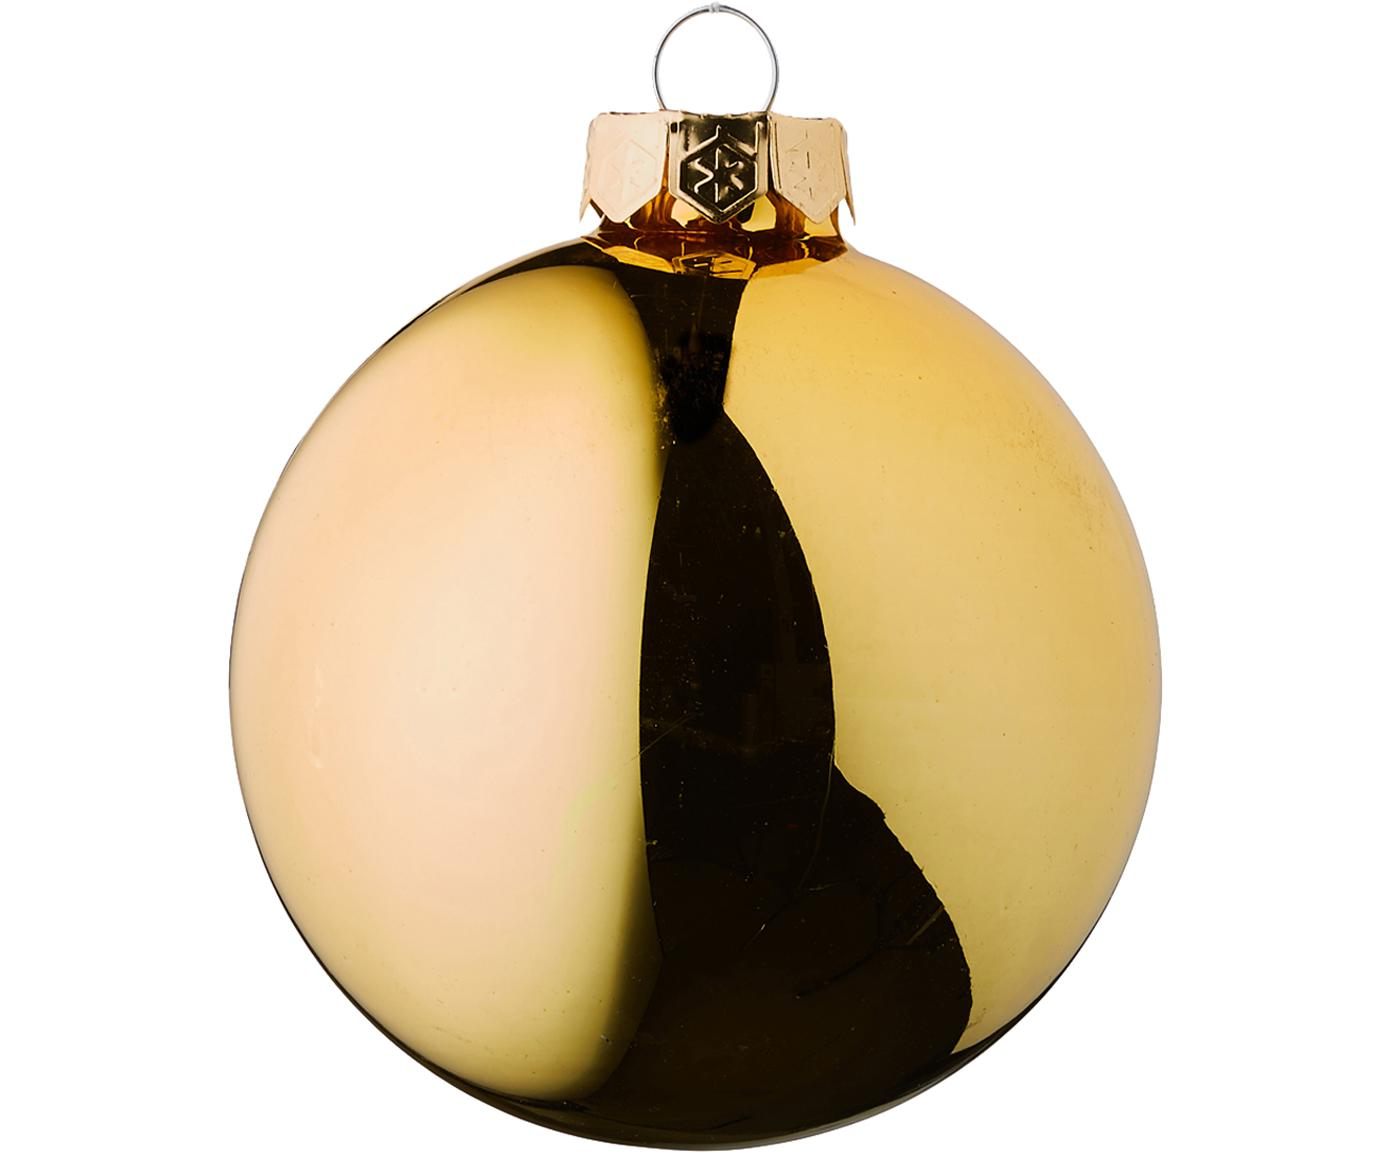 Weihnachtskugel-Set Evergreen Ø8cm,6-tlg., Goldfarben, Ø 8 cm